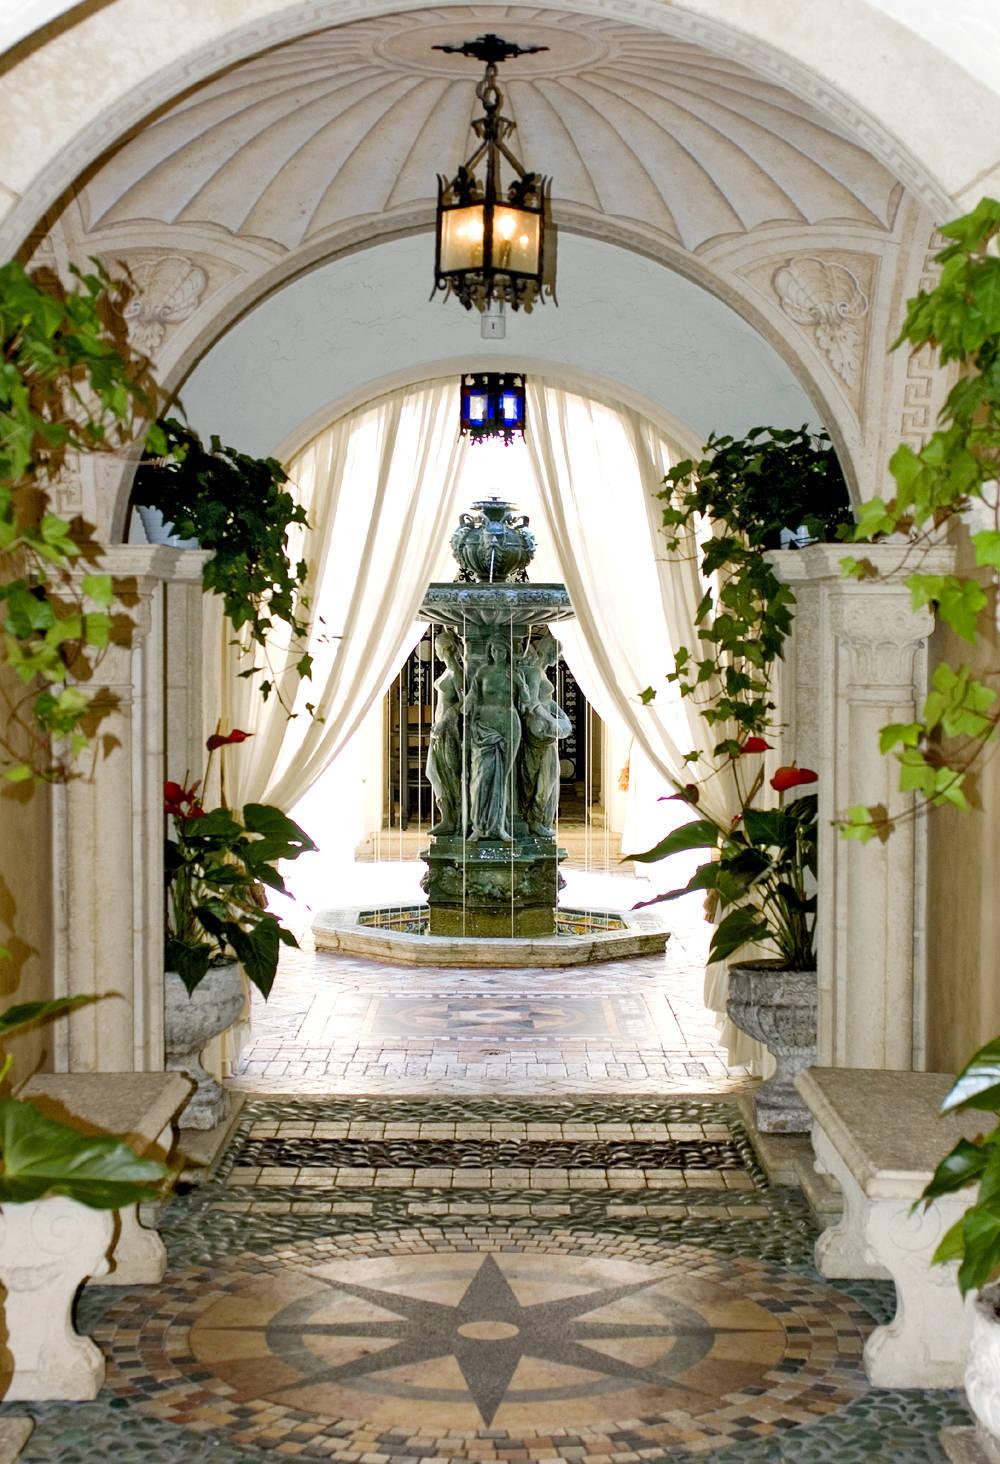 Gianni-Versace-Casa-Casuarina-Daytime-Mansion-Courtyard-Fountain1